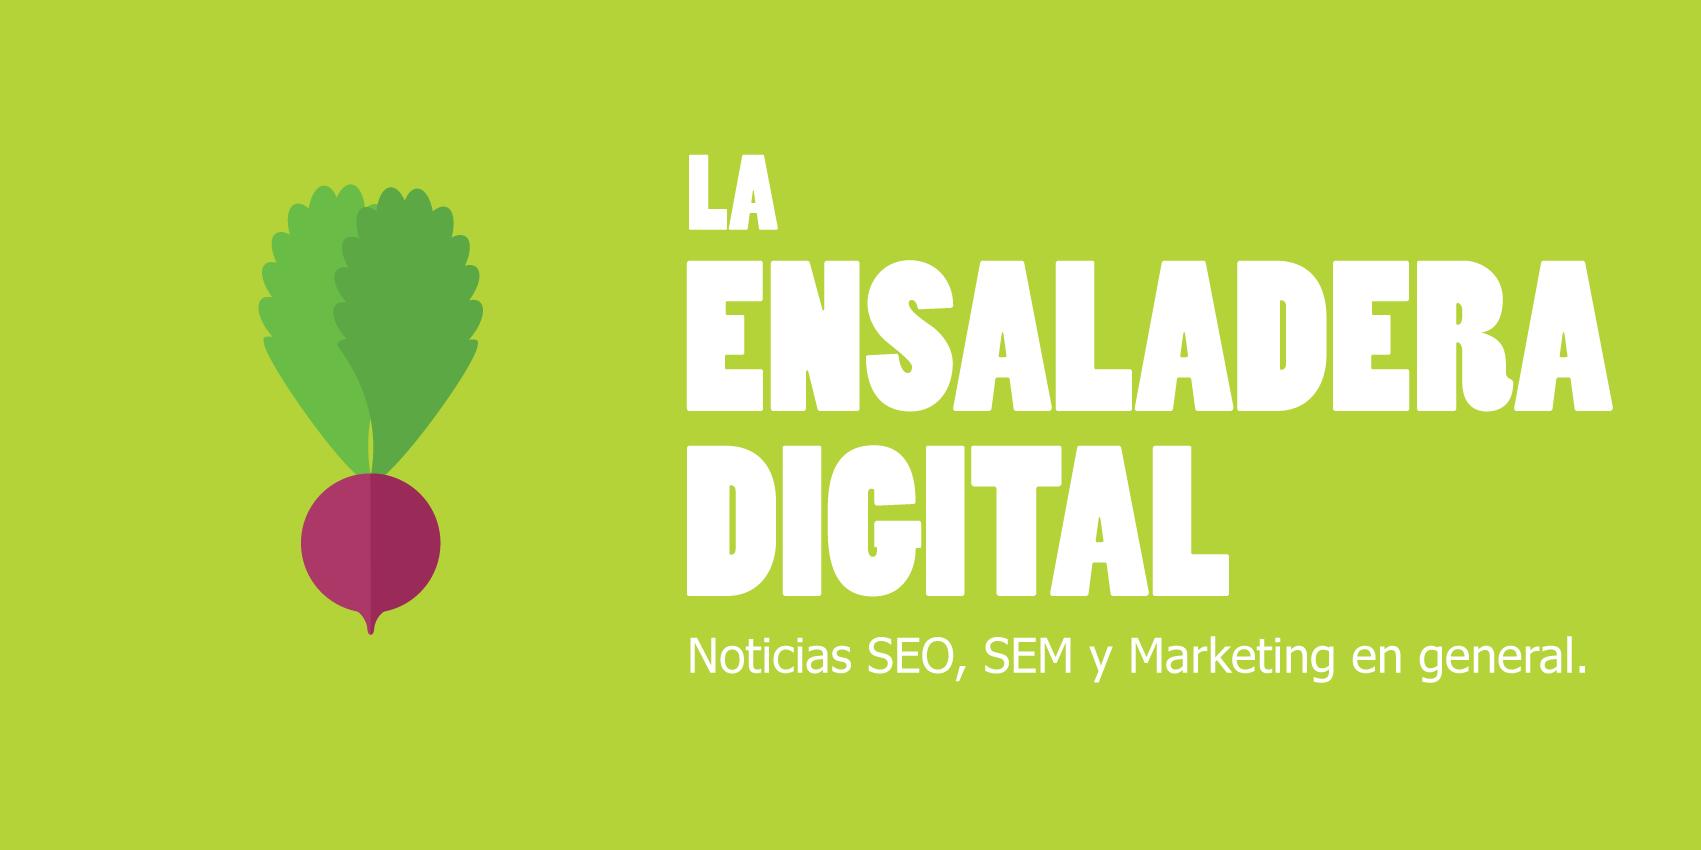 la-ensaladera-digital-02